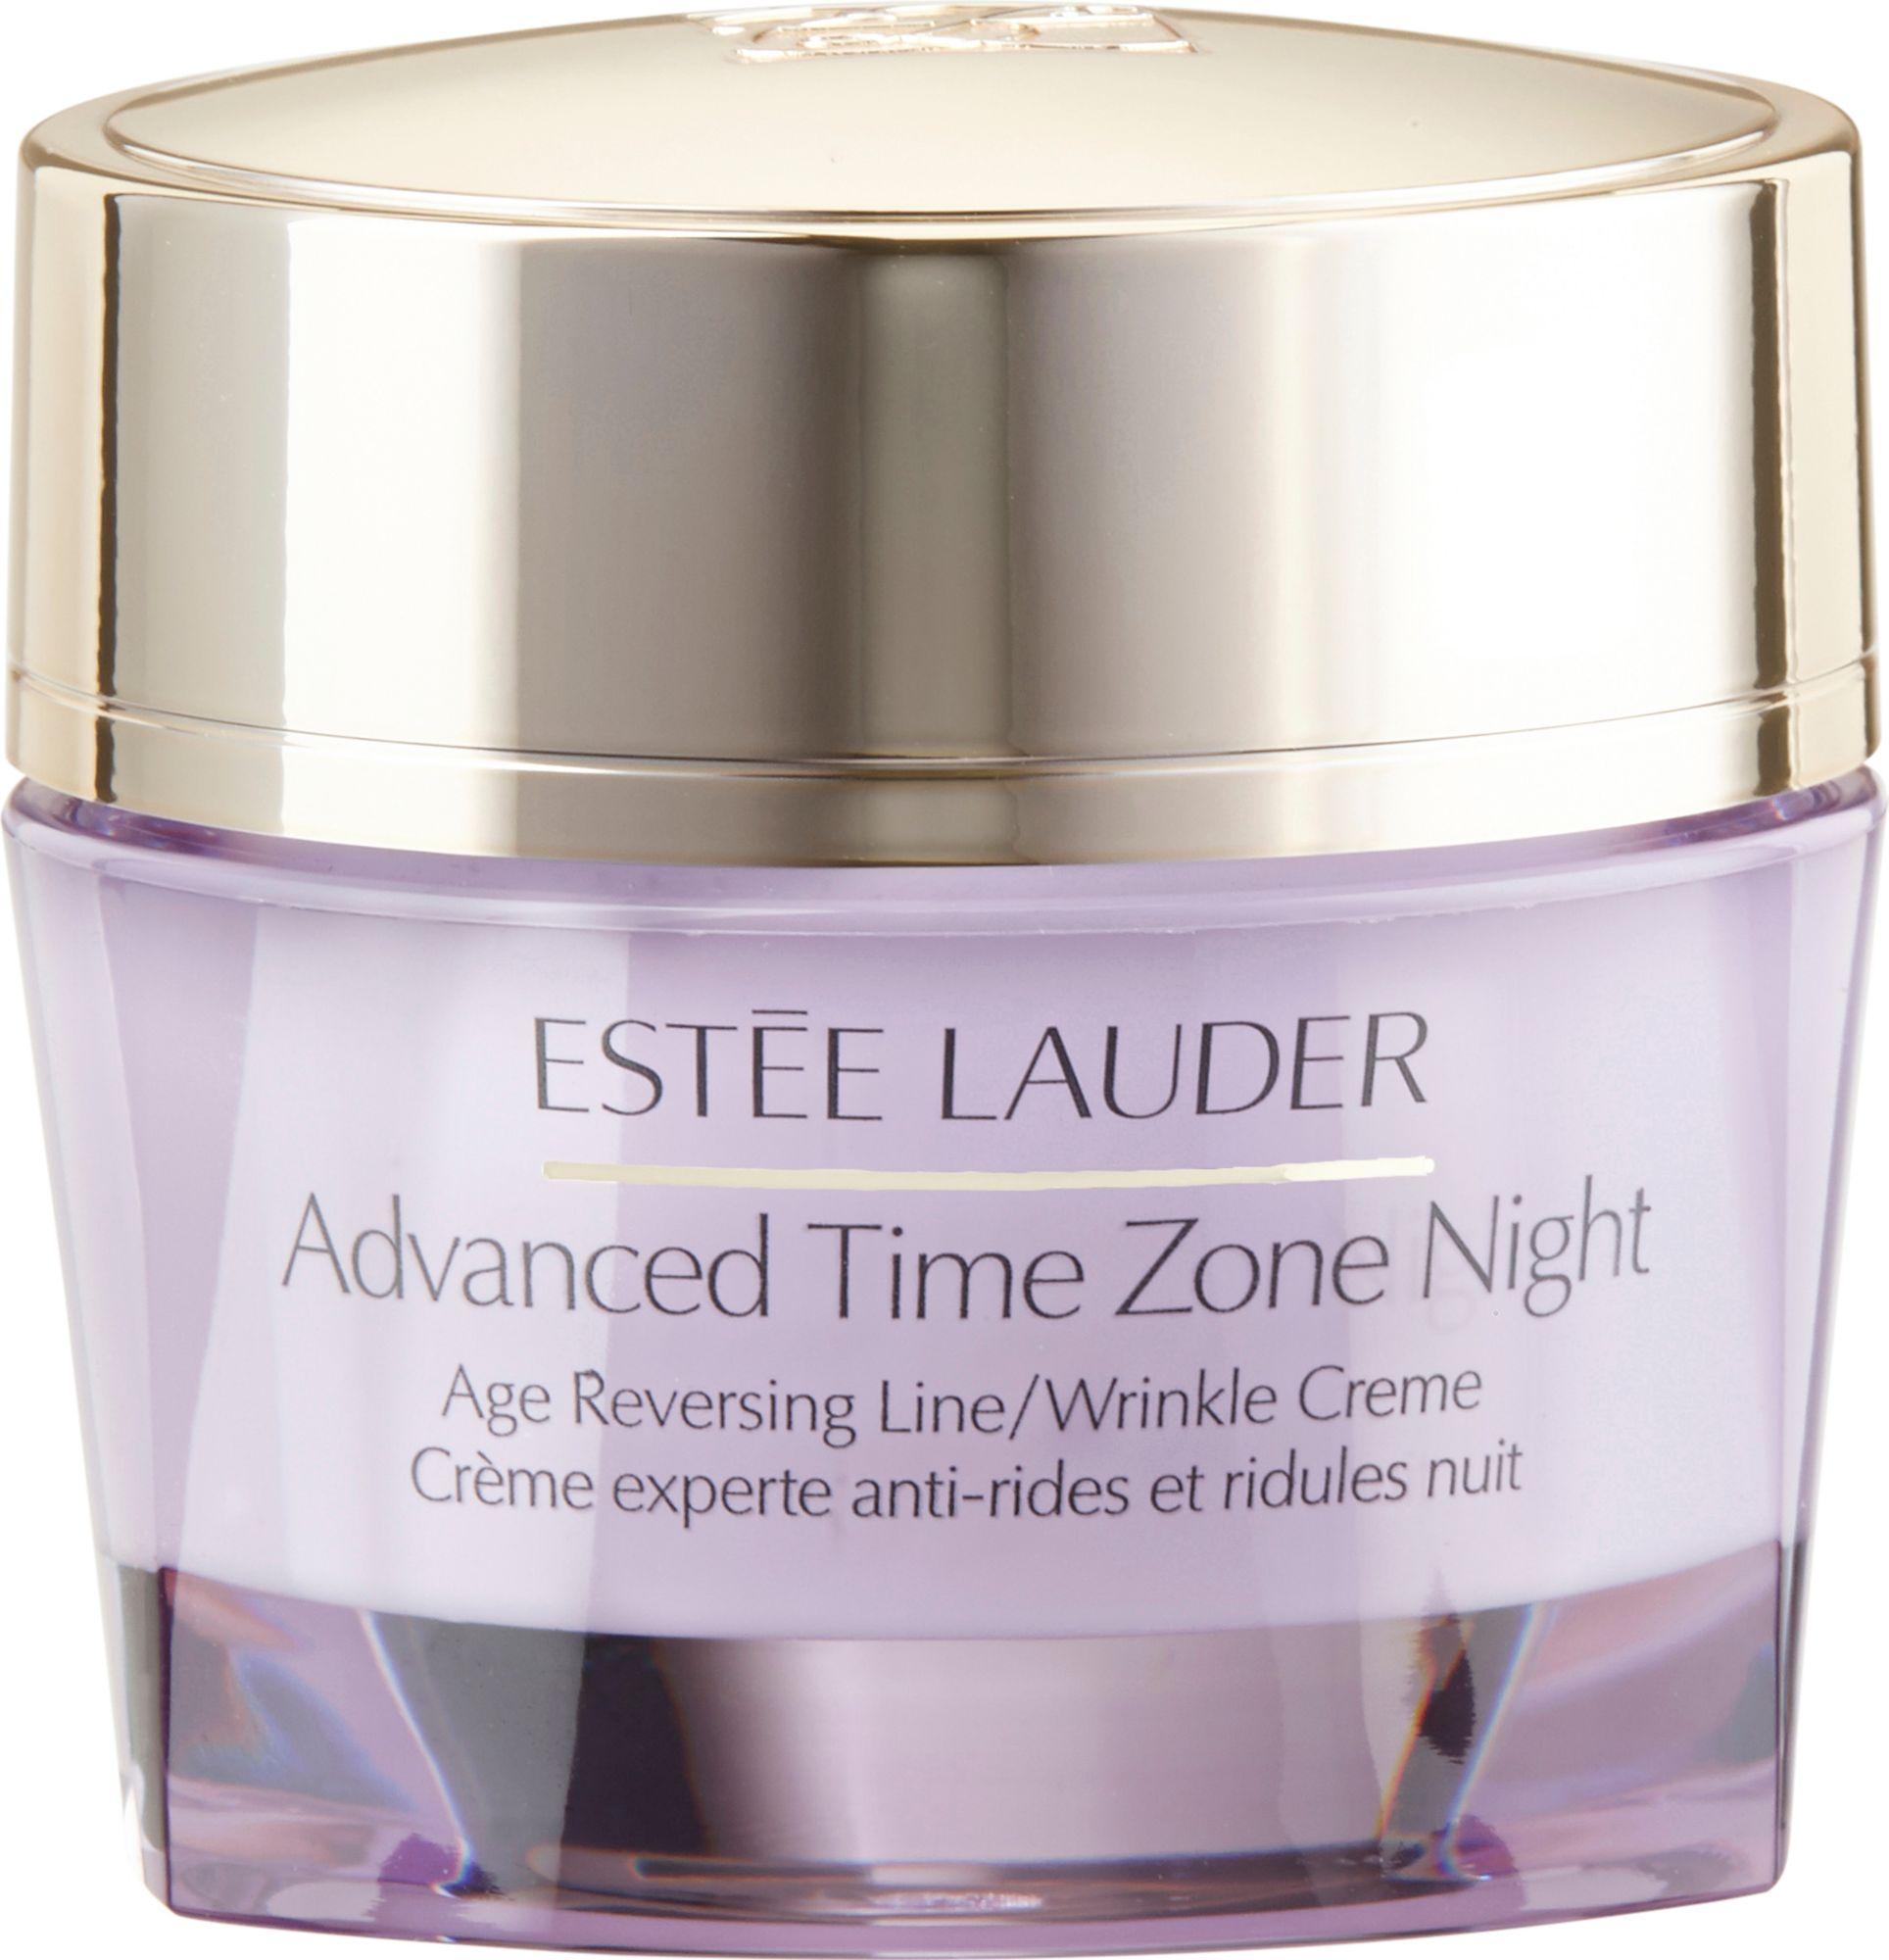 ESTEE LAUDER Estée Lauder, »Advanced Time Zone Night Creme«, Anti-Aging Nachtcreme